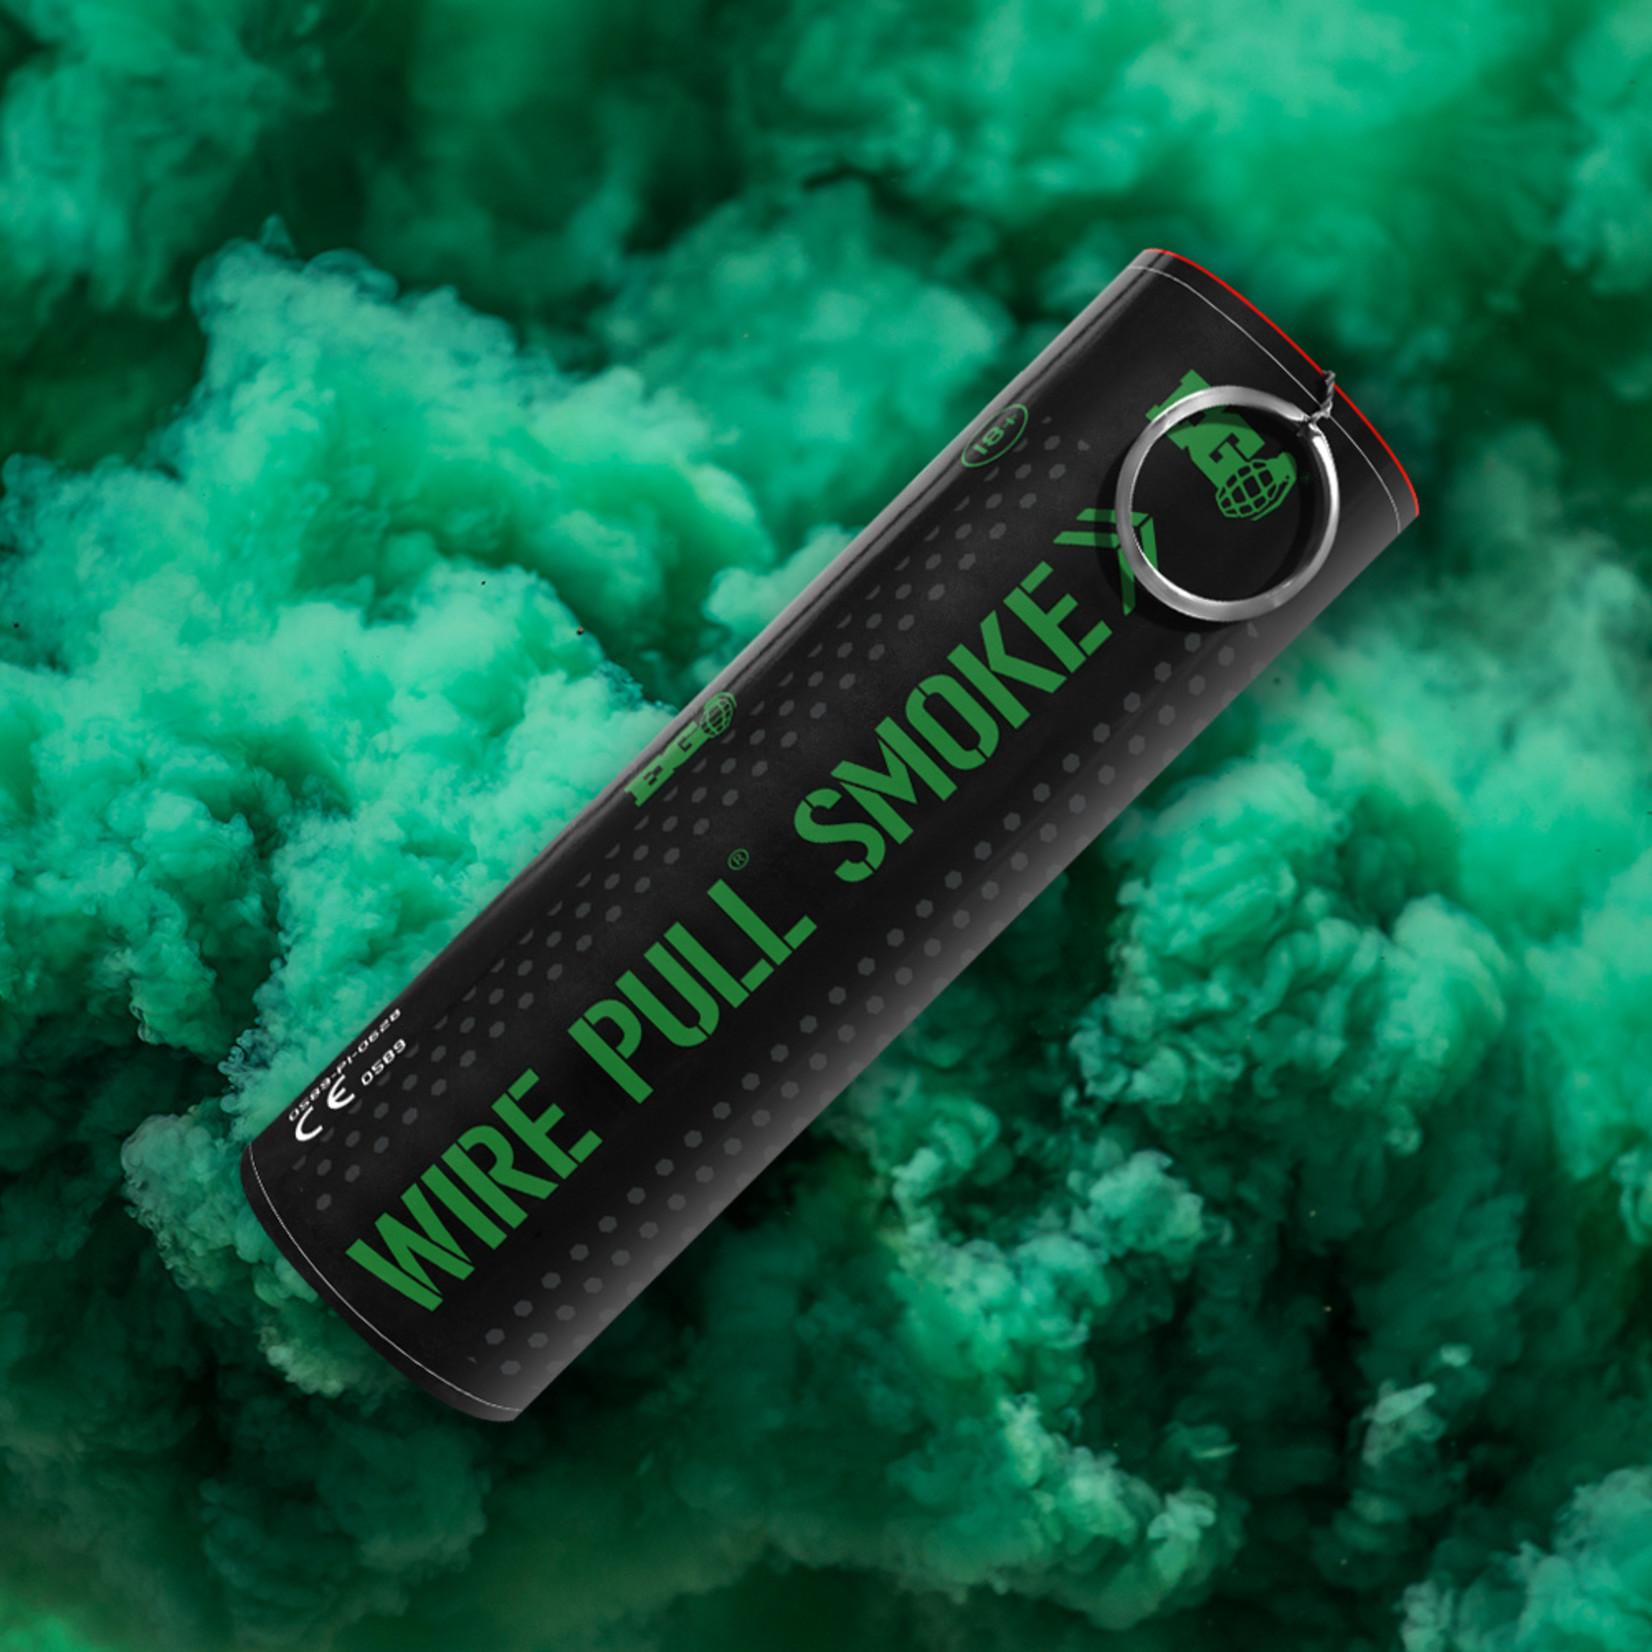 Wirepull - Green Smoke Grenade